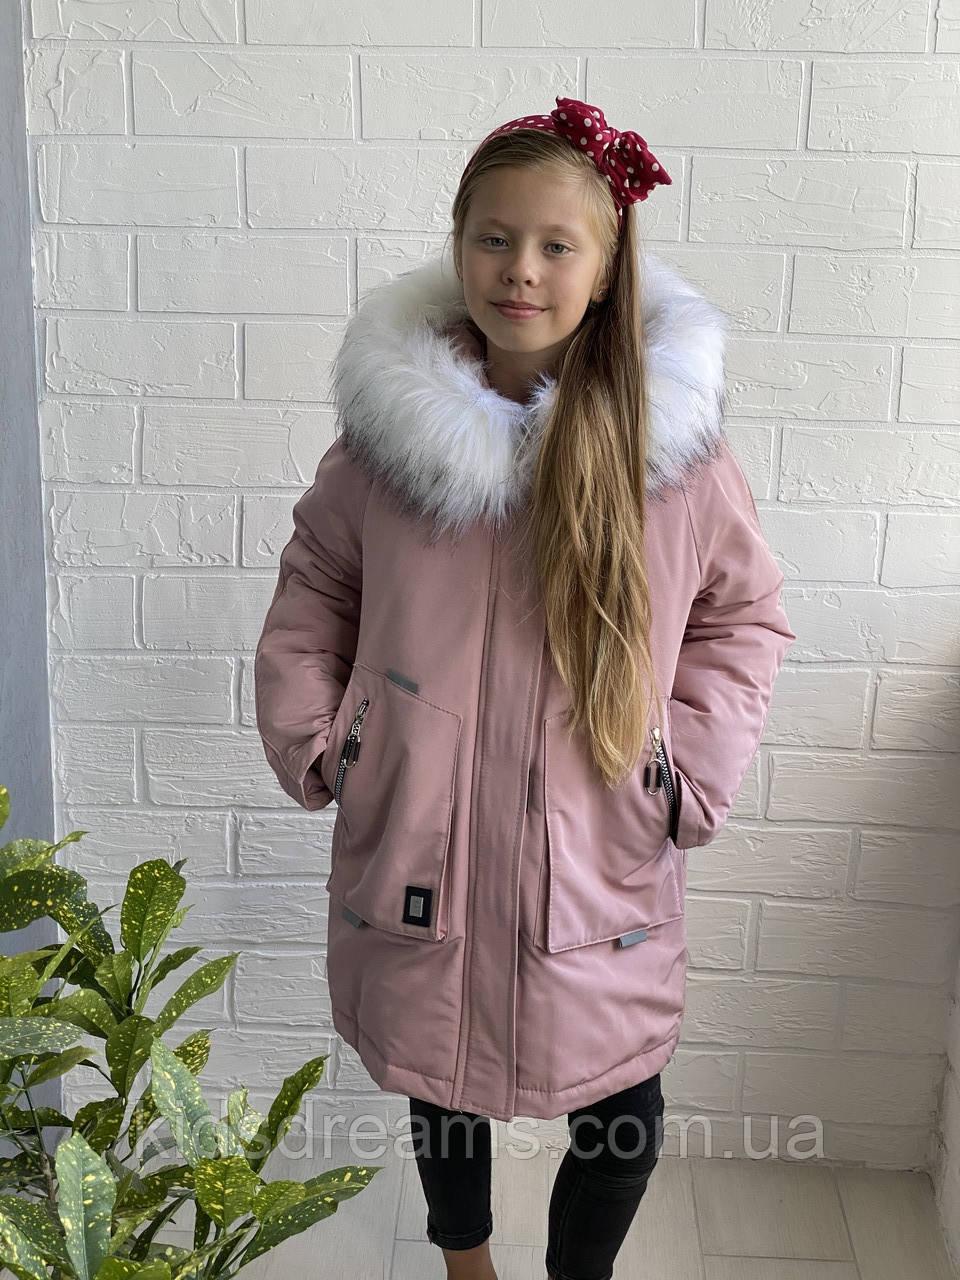 Зимняя Парка на девочку 140-158рост